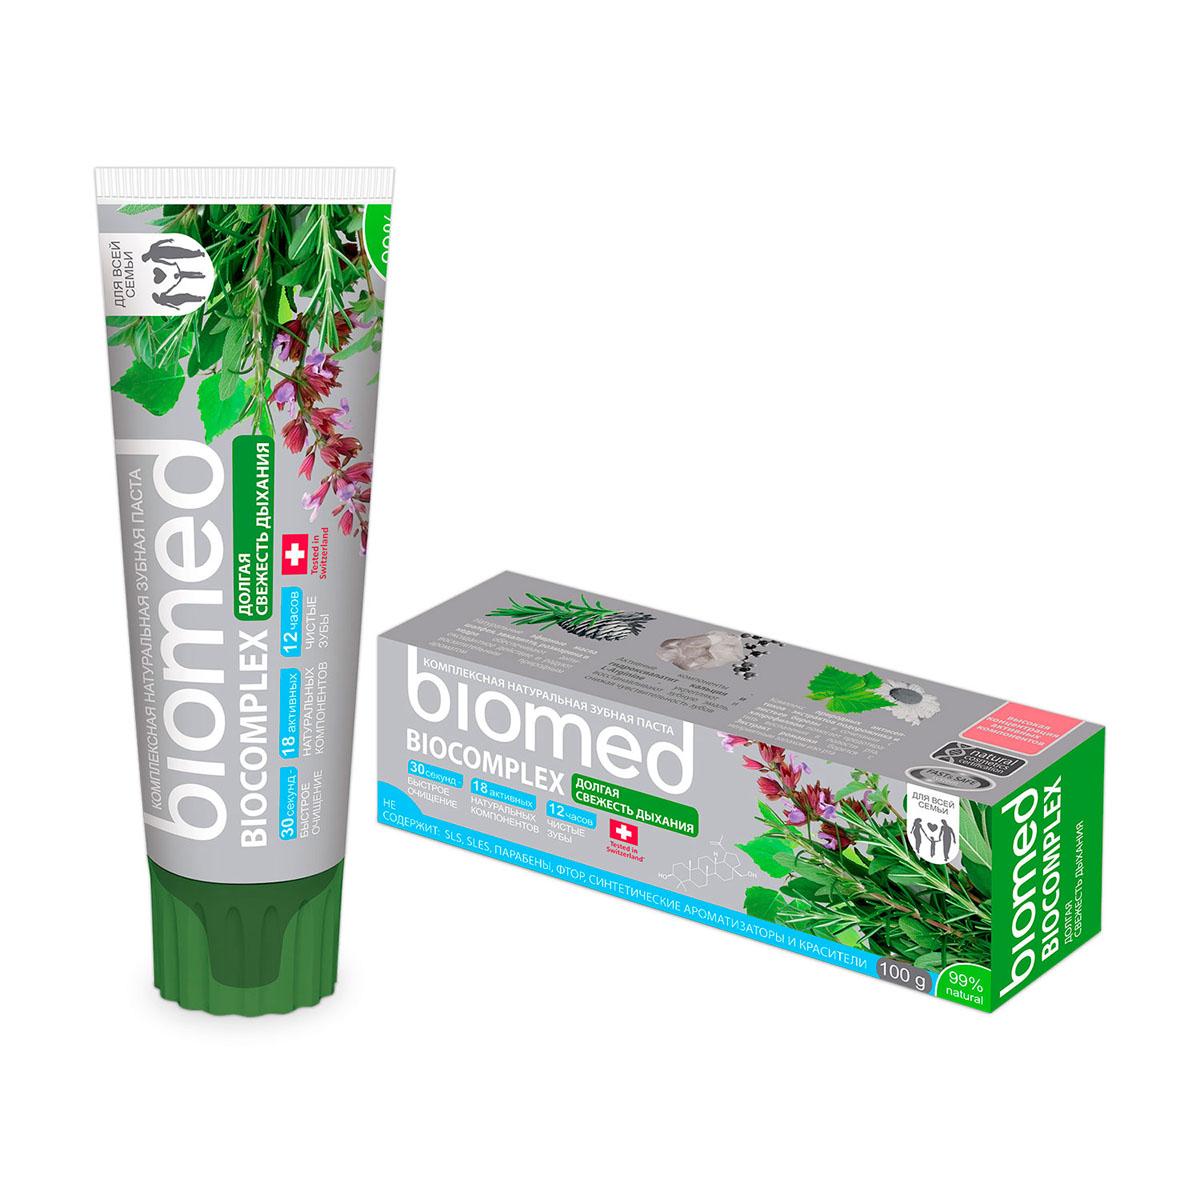 Biomed Зубная паста Biocomplex / Биокомплекс, 100 г